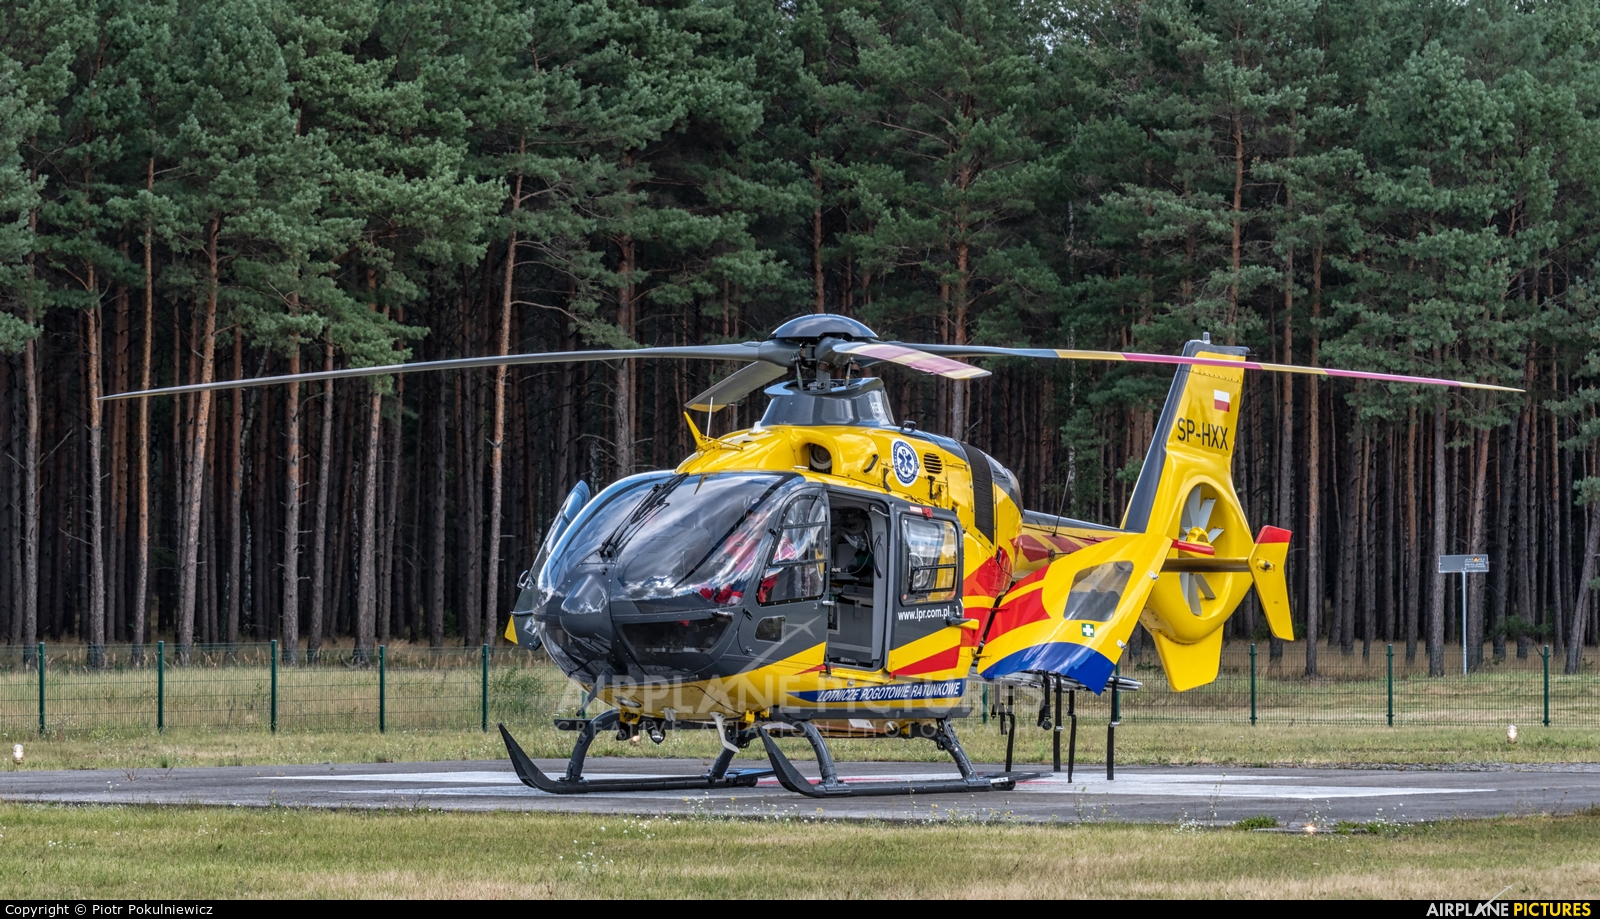 Polish Medical Air Rescue - Lotnicze Pogotowie Ratunkowe SP-HXX aircraft at Piła